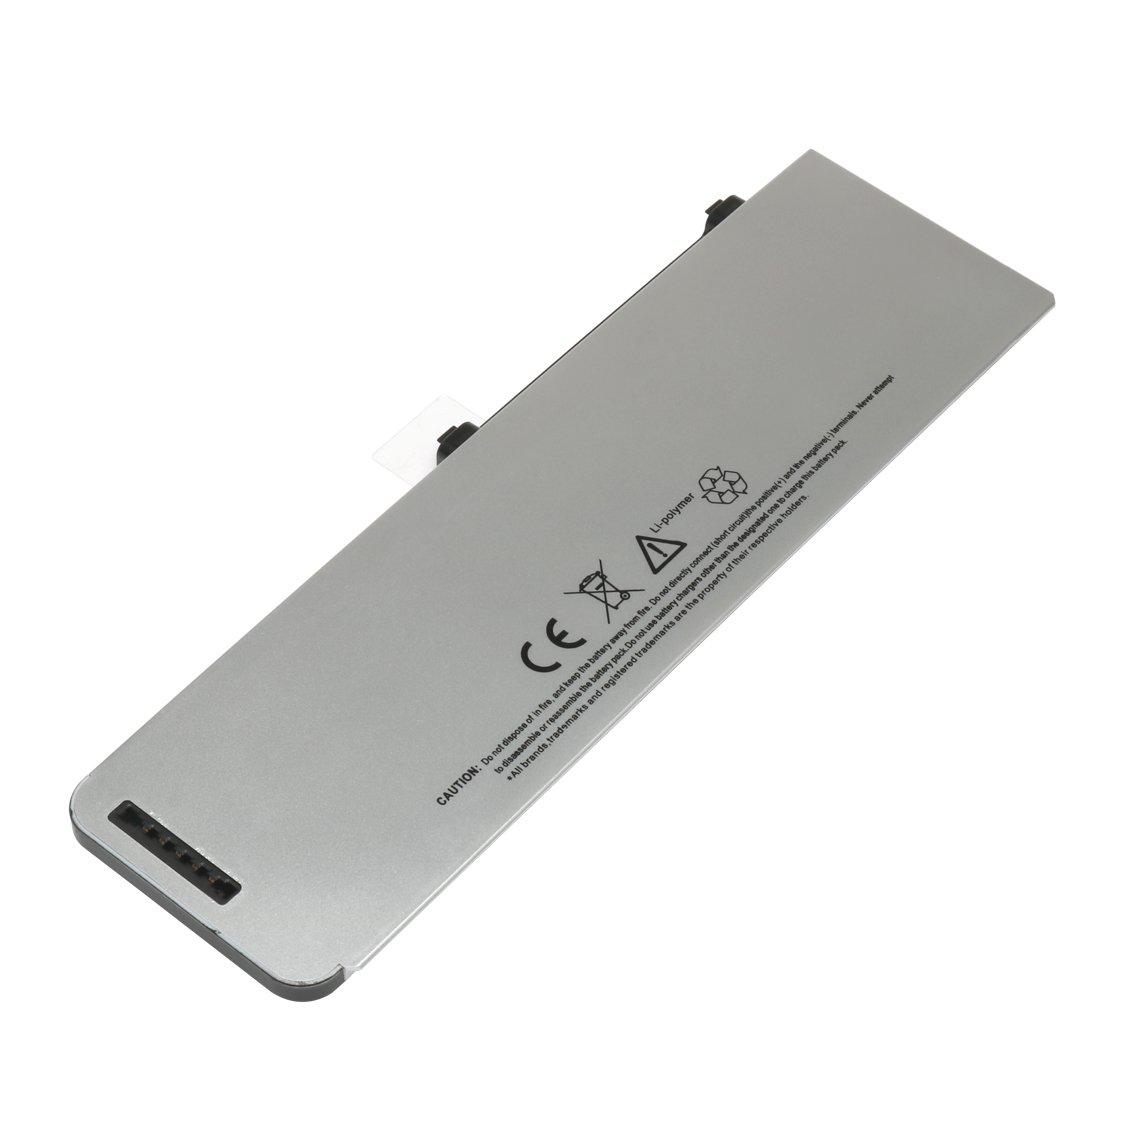 Bateria A1281 Para 2008 Macbook Pro 15 A1286 Mb772 Mb772/a Mb772j/a 56wh-12